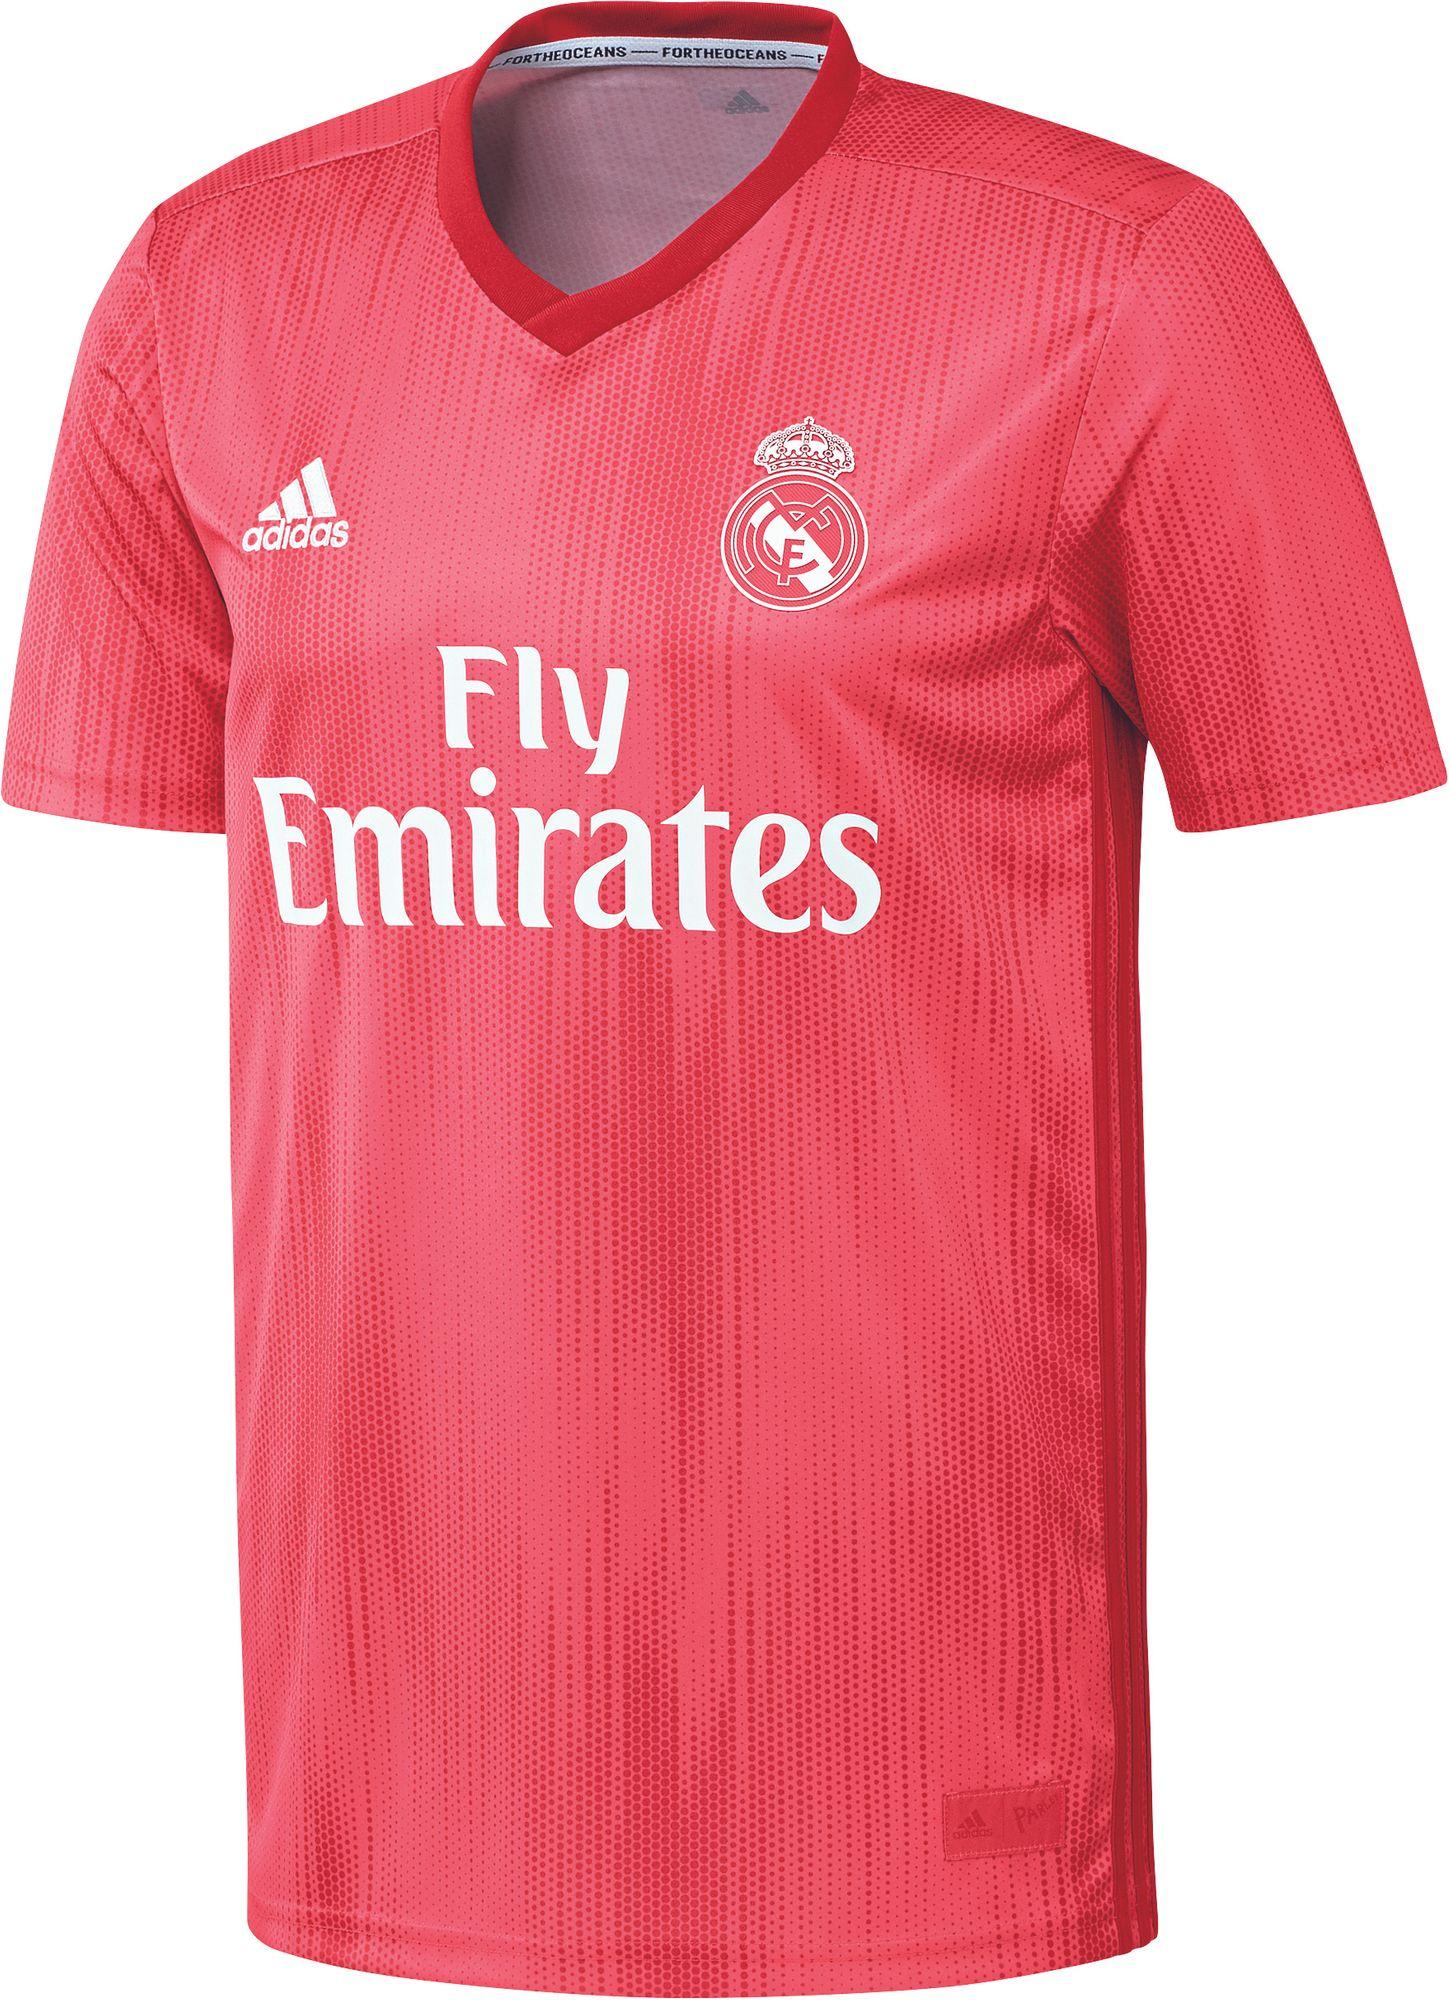 Adidas Real Madrid Trikot 3rd Kinder 2018 2019 Fantrikots